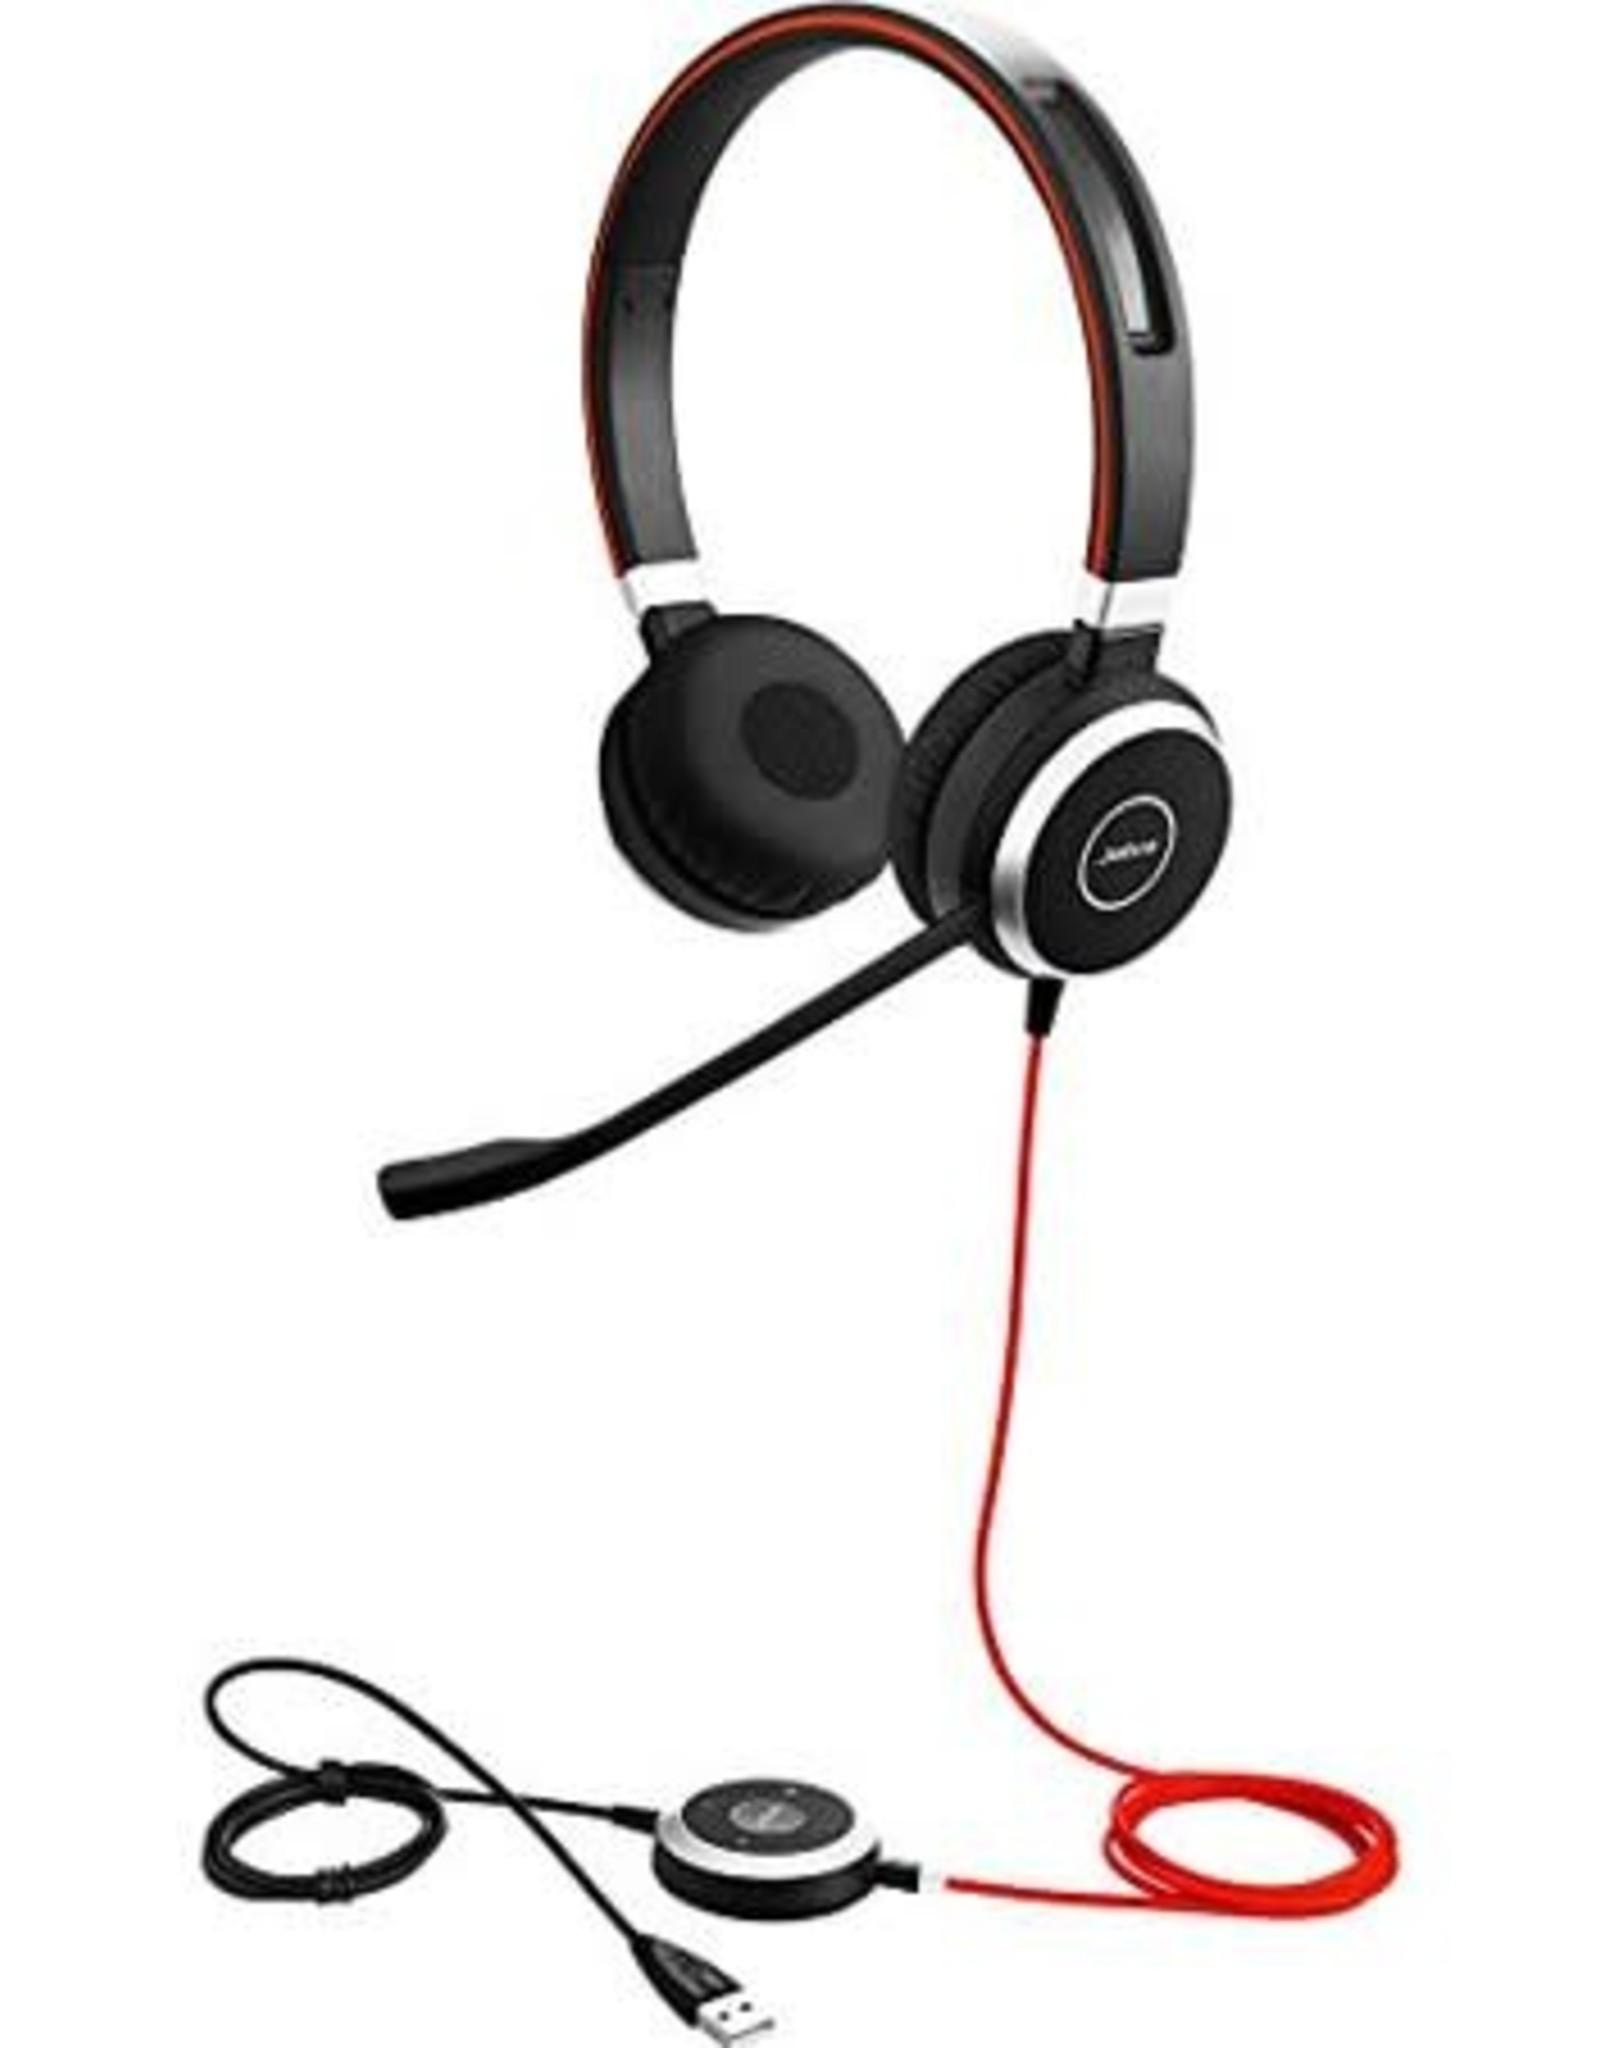 Jabra Jabra Evolve 40 Stereo Professional Headset 100-55910000-02